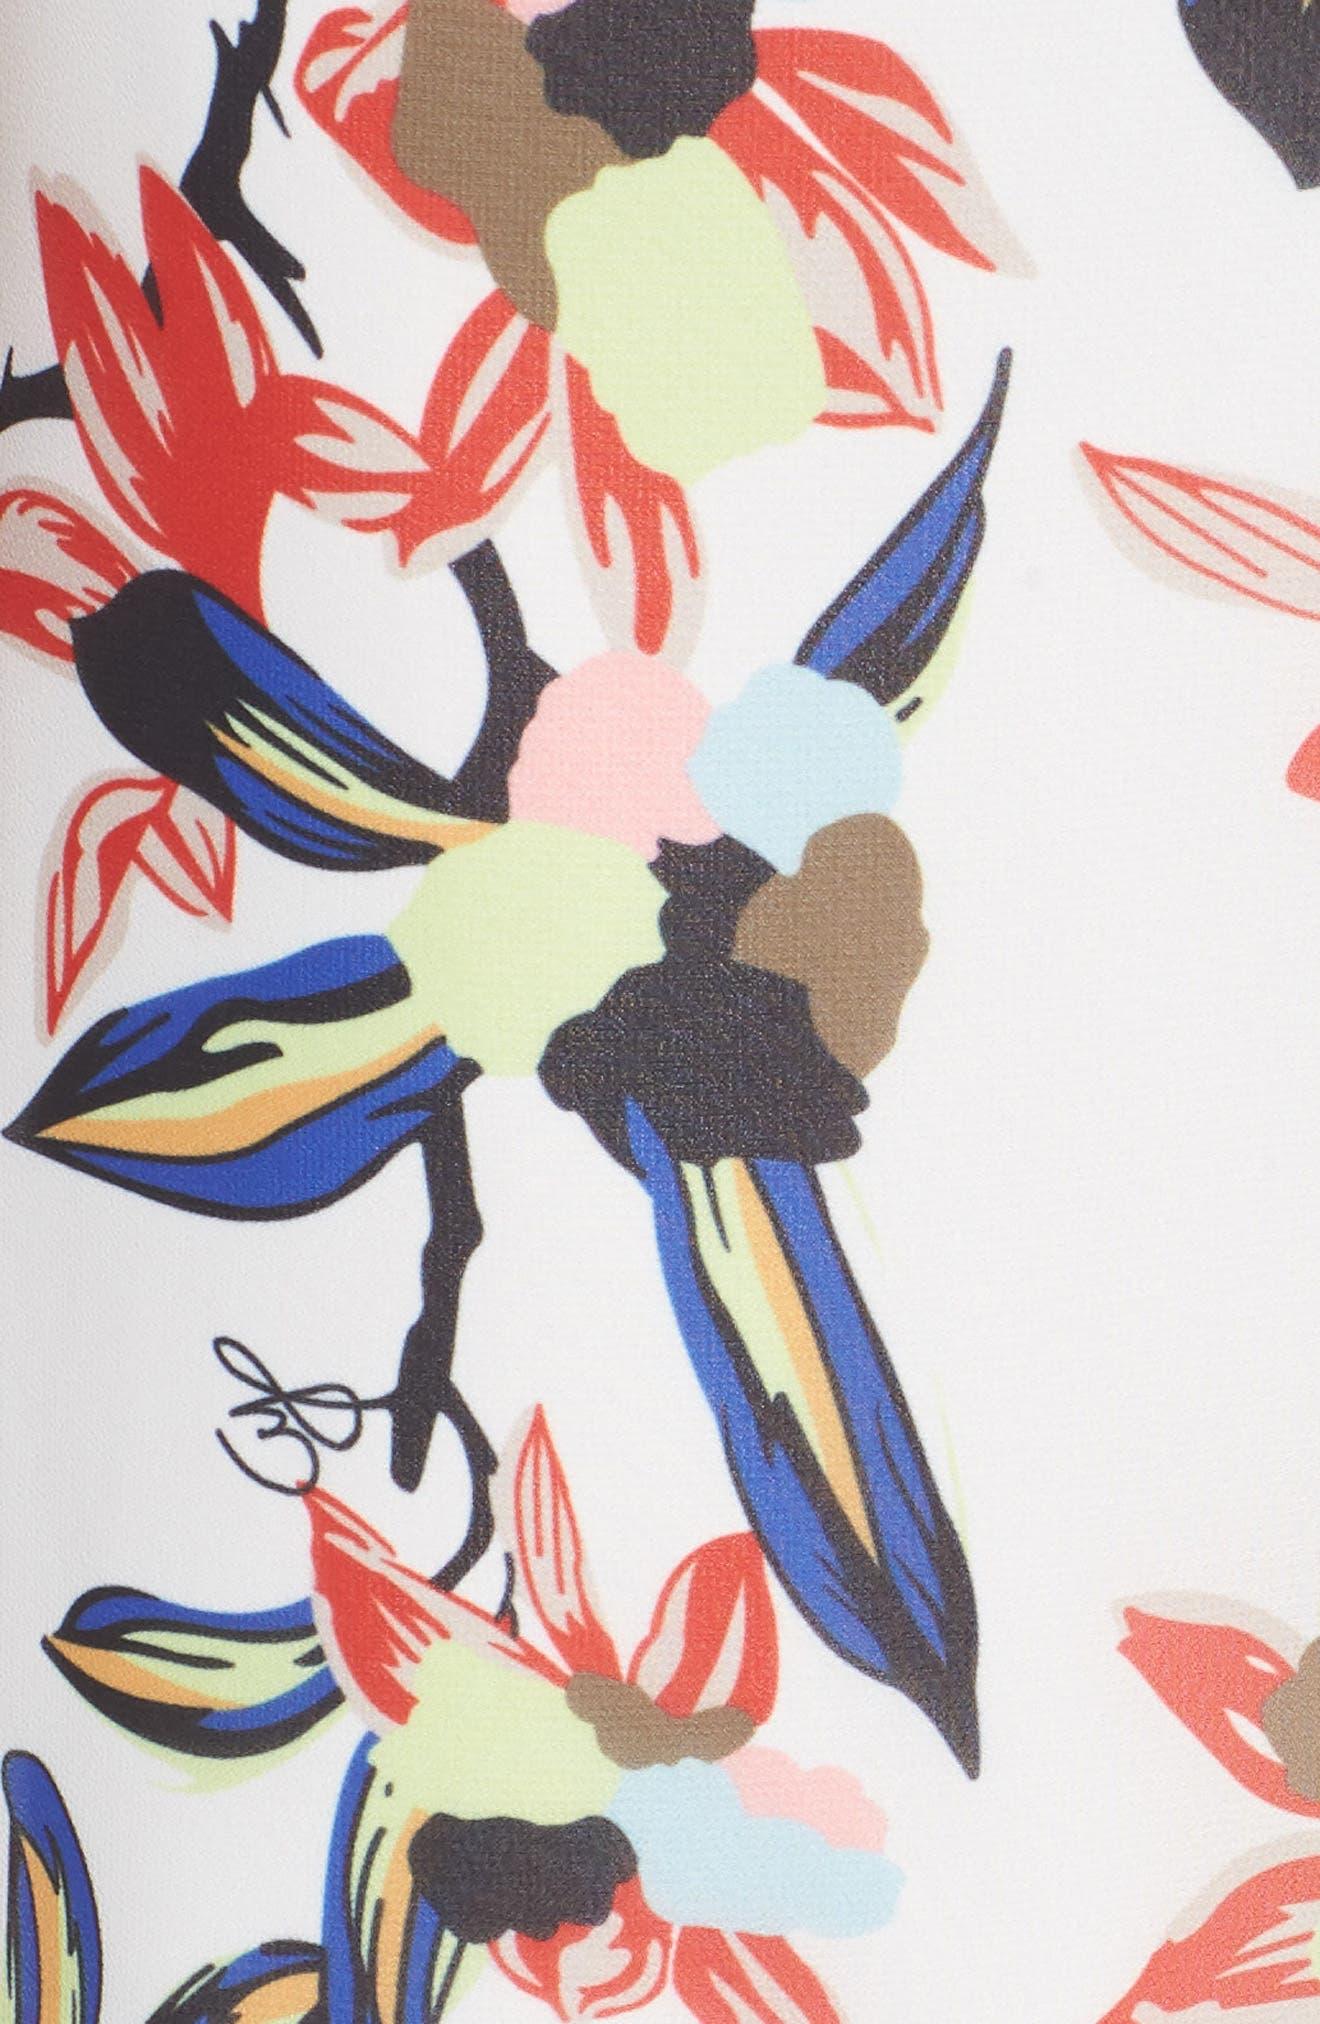 Floral Print Maxi Dress,                             Alternate thumbnail 6, color,                             165